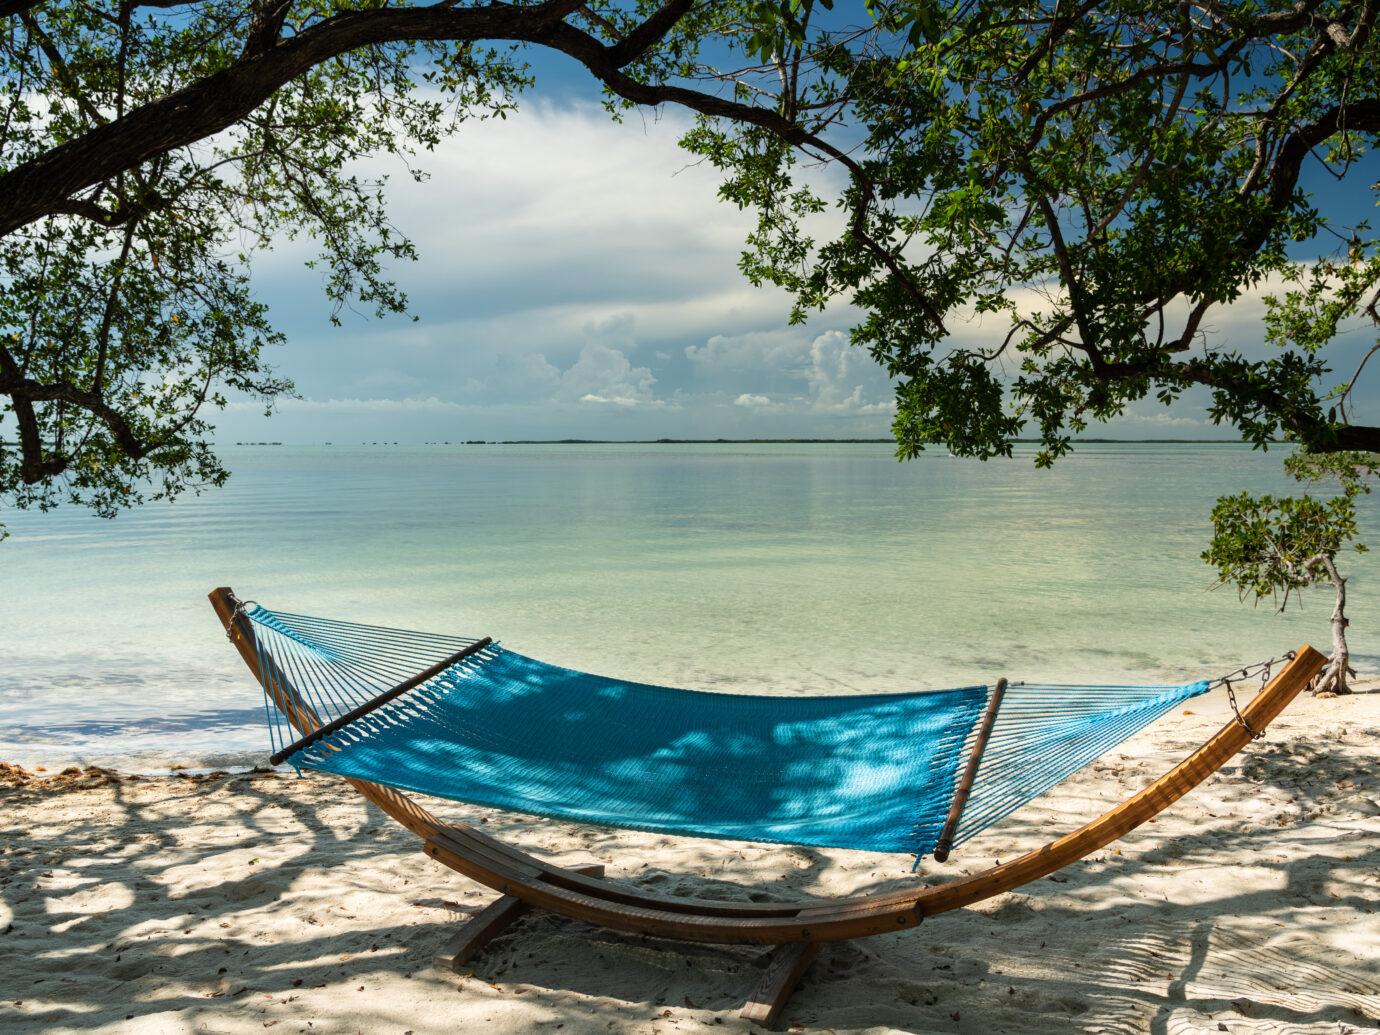 Hammock by the beach at Baker's Cay Resort